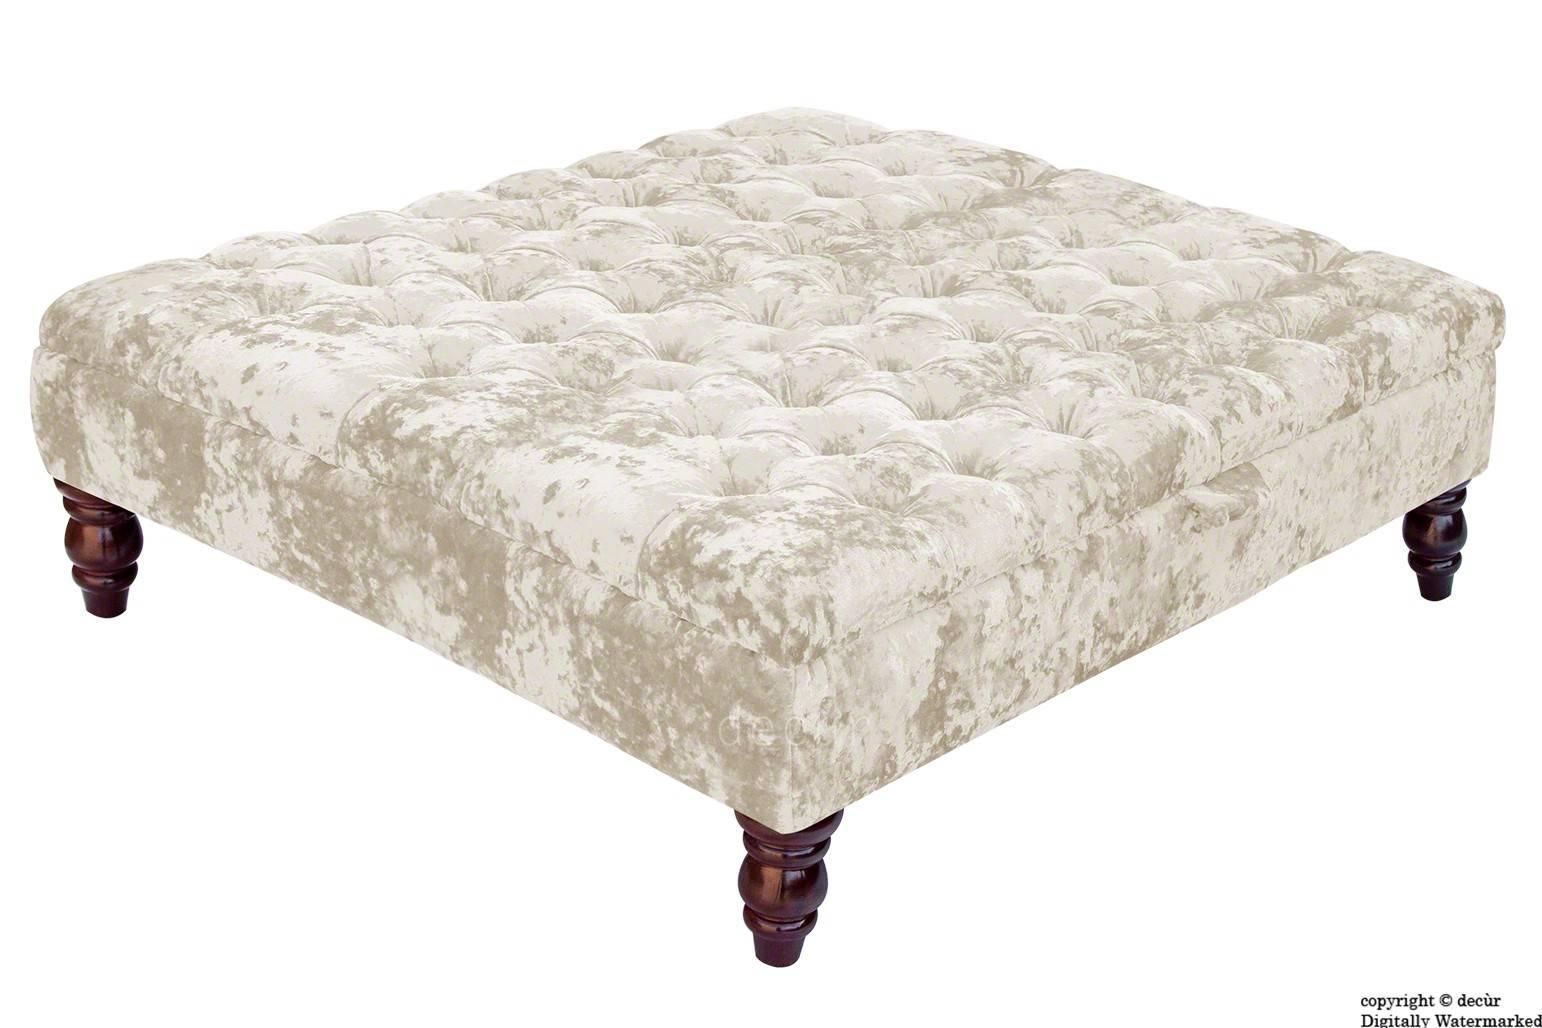 Bespoke Designer Sofas, Footstools, Bespoke Footstools, Bespoke inside Velvet Footstool (Image 2 of 30)